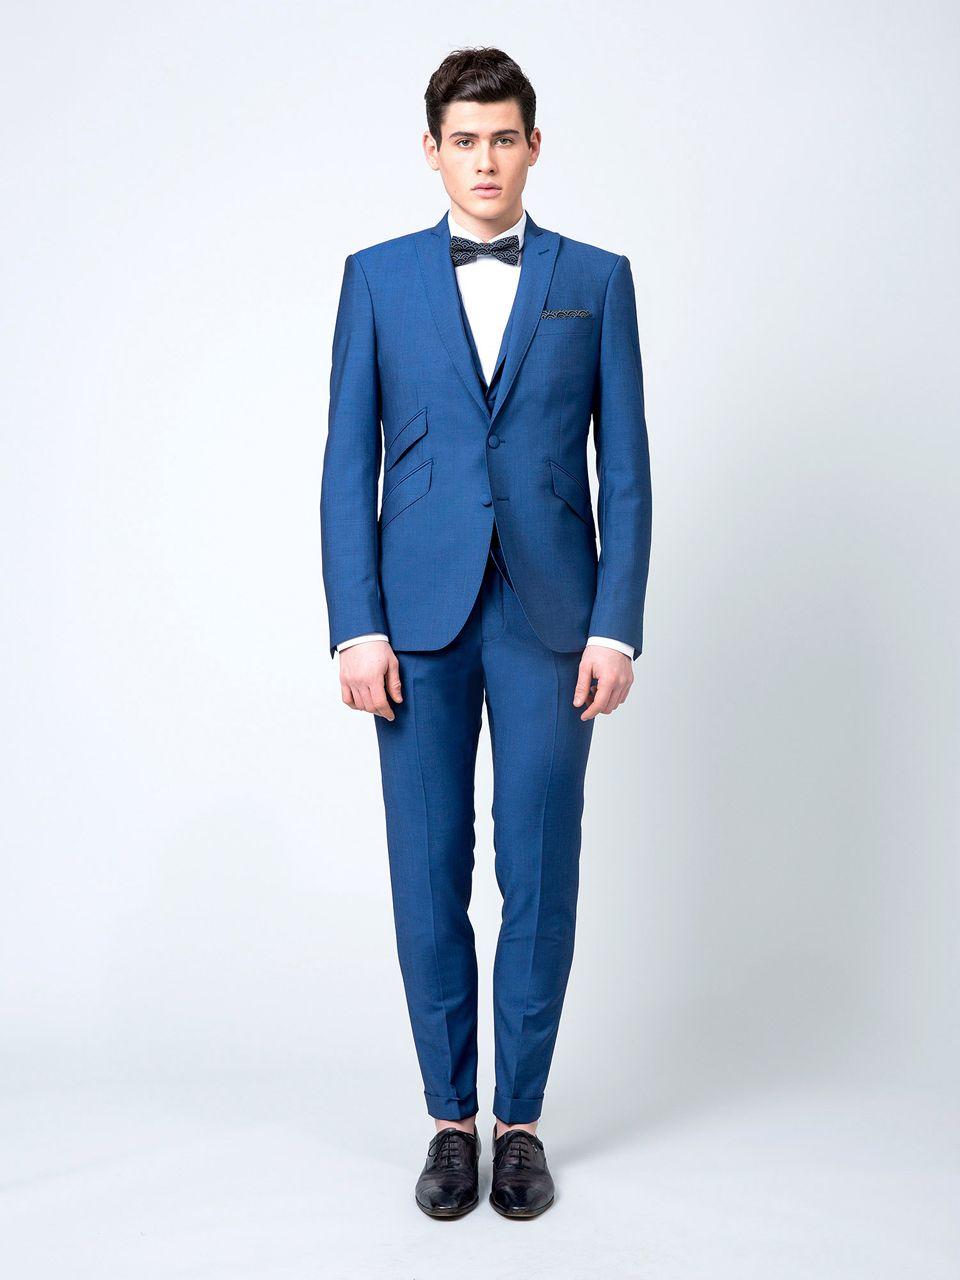 tendances pour le mari costume bleu roi samson noeud papillon costume mari pinterest. Black Bedroom Furniture Sets. Home Design Ideas